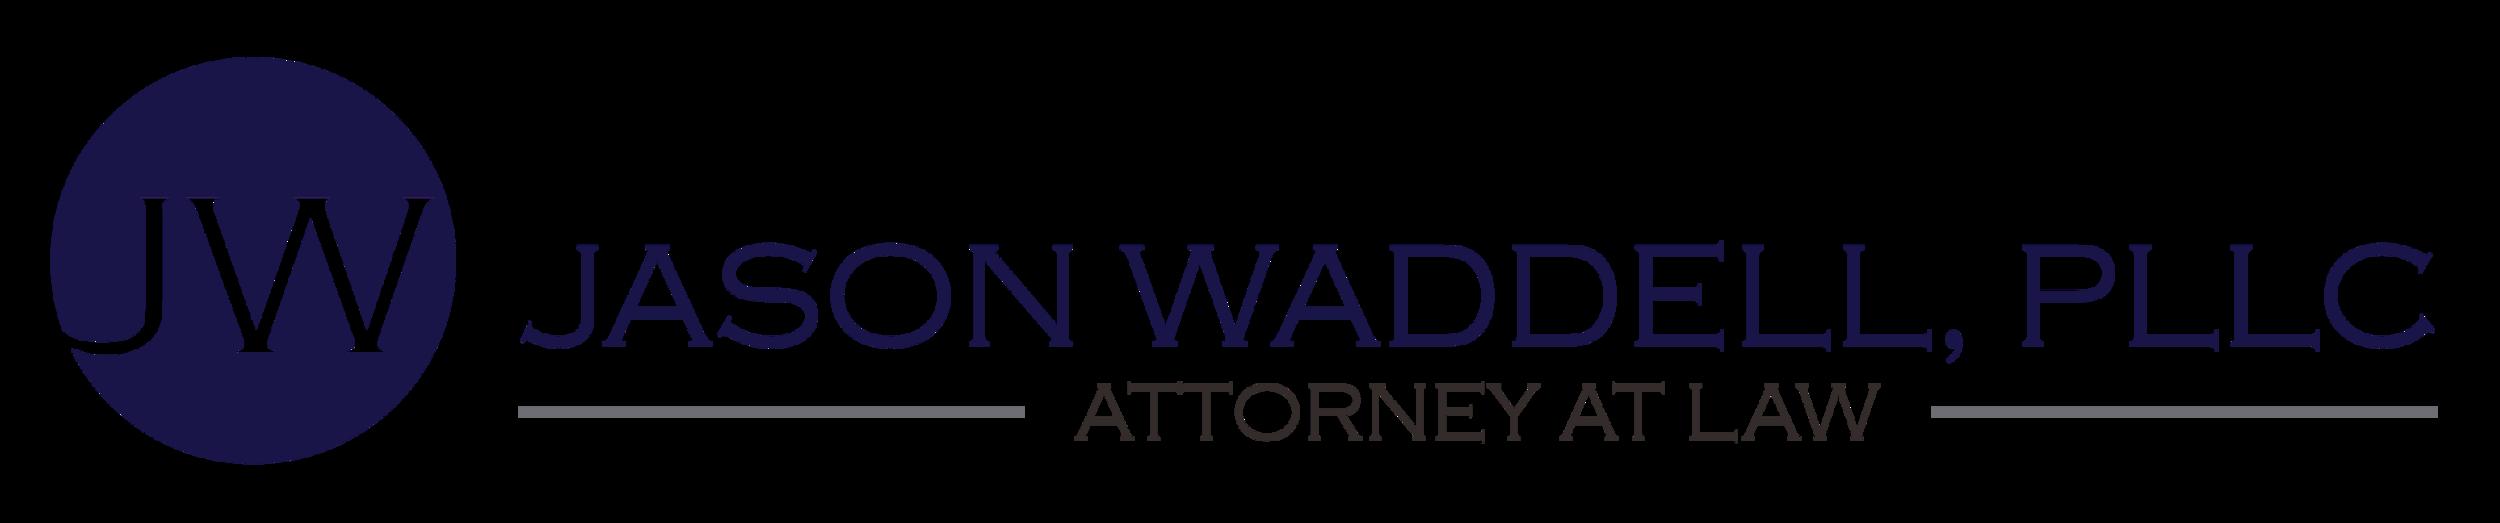 Jason Waddell Law